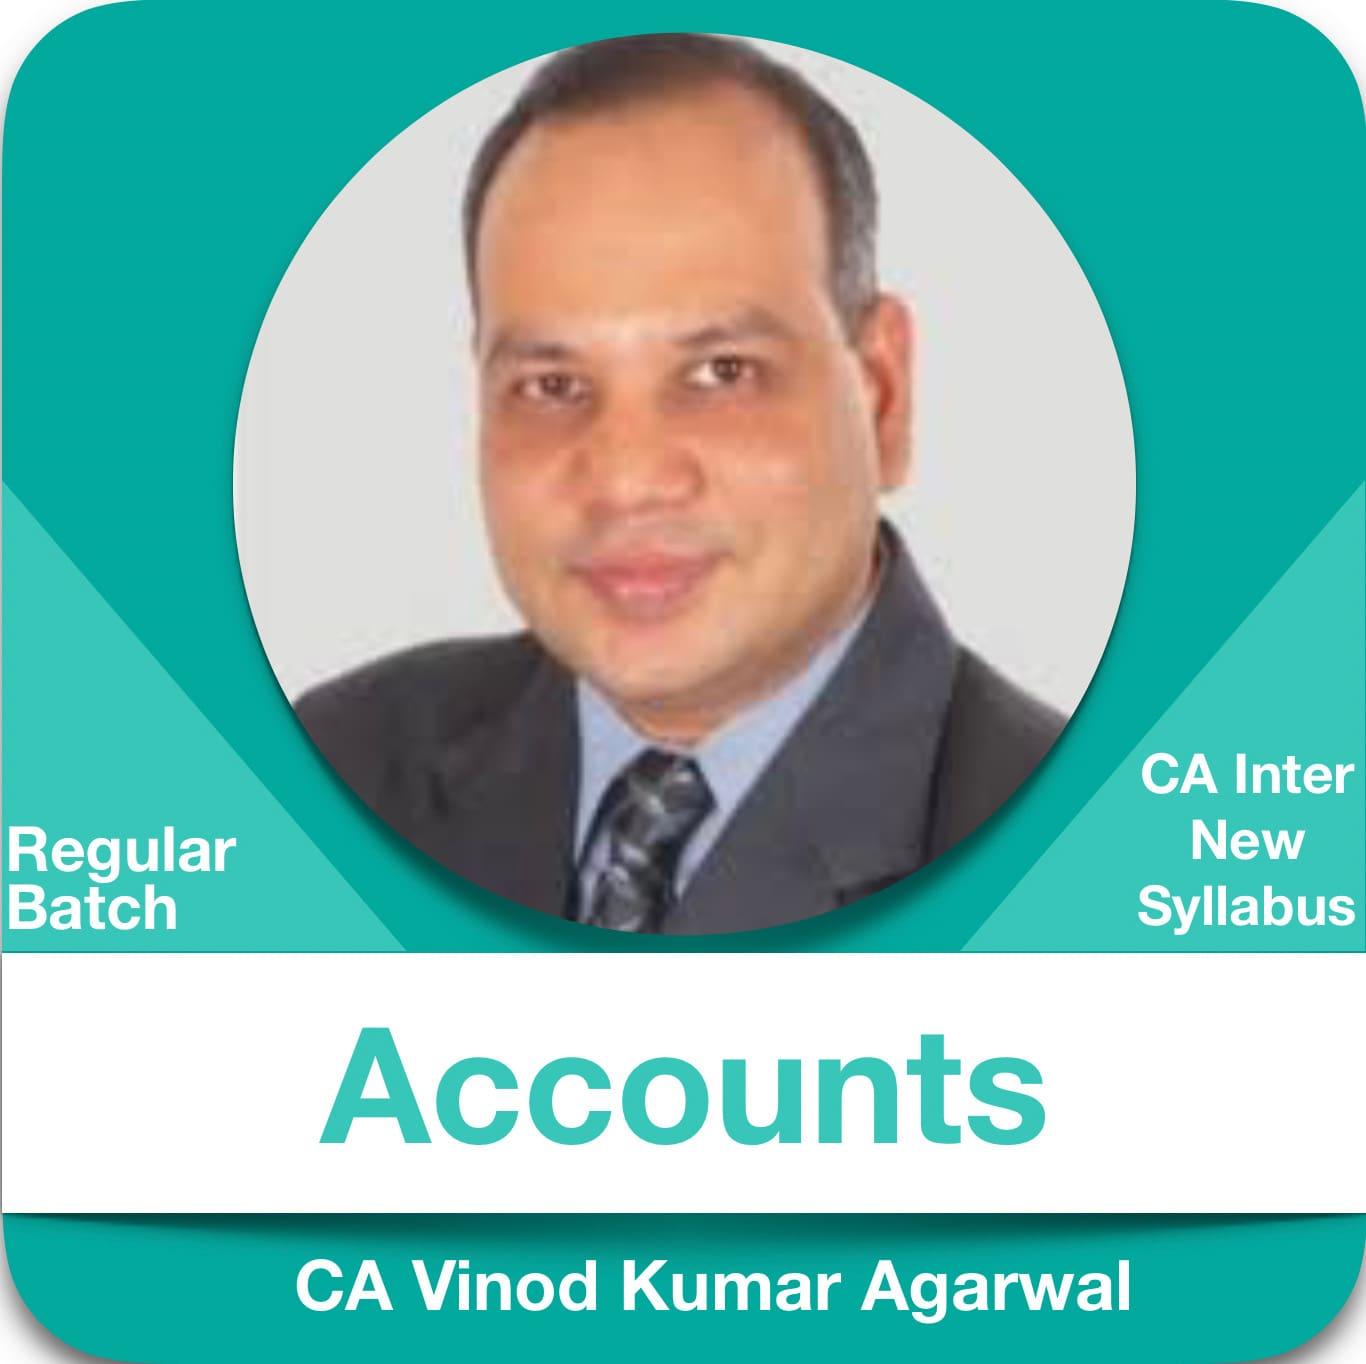 Accounts (1.5 & 1.2 View) Regular Batch in Hindi